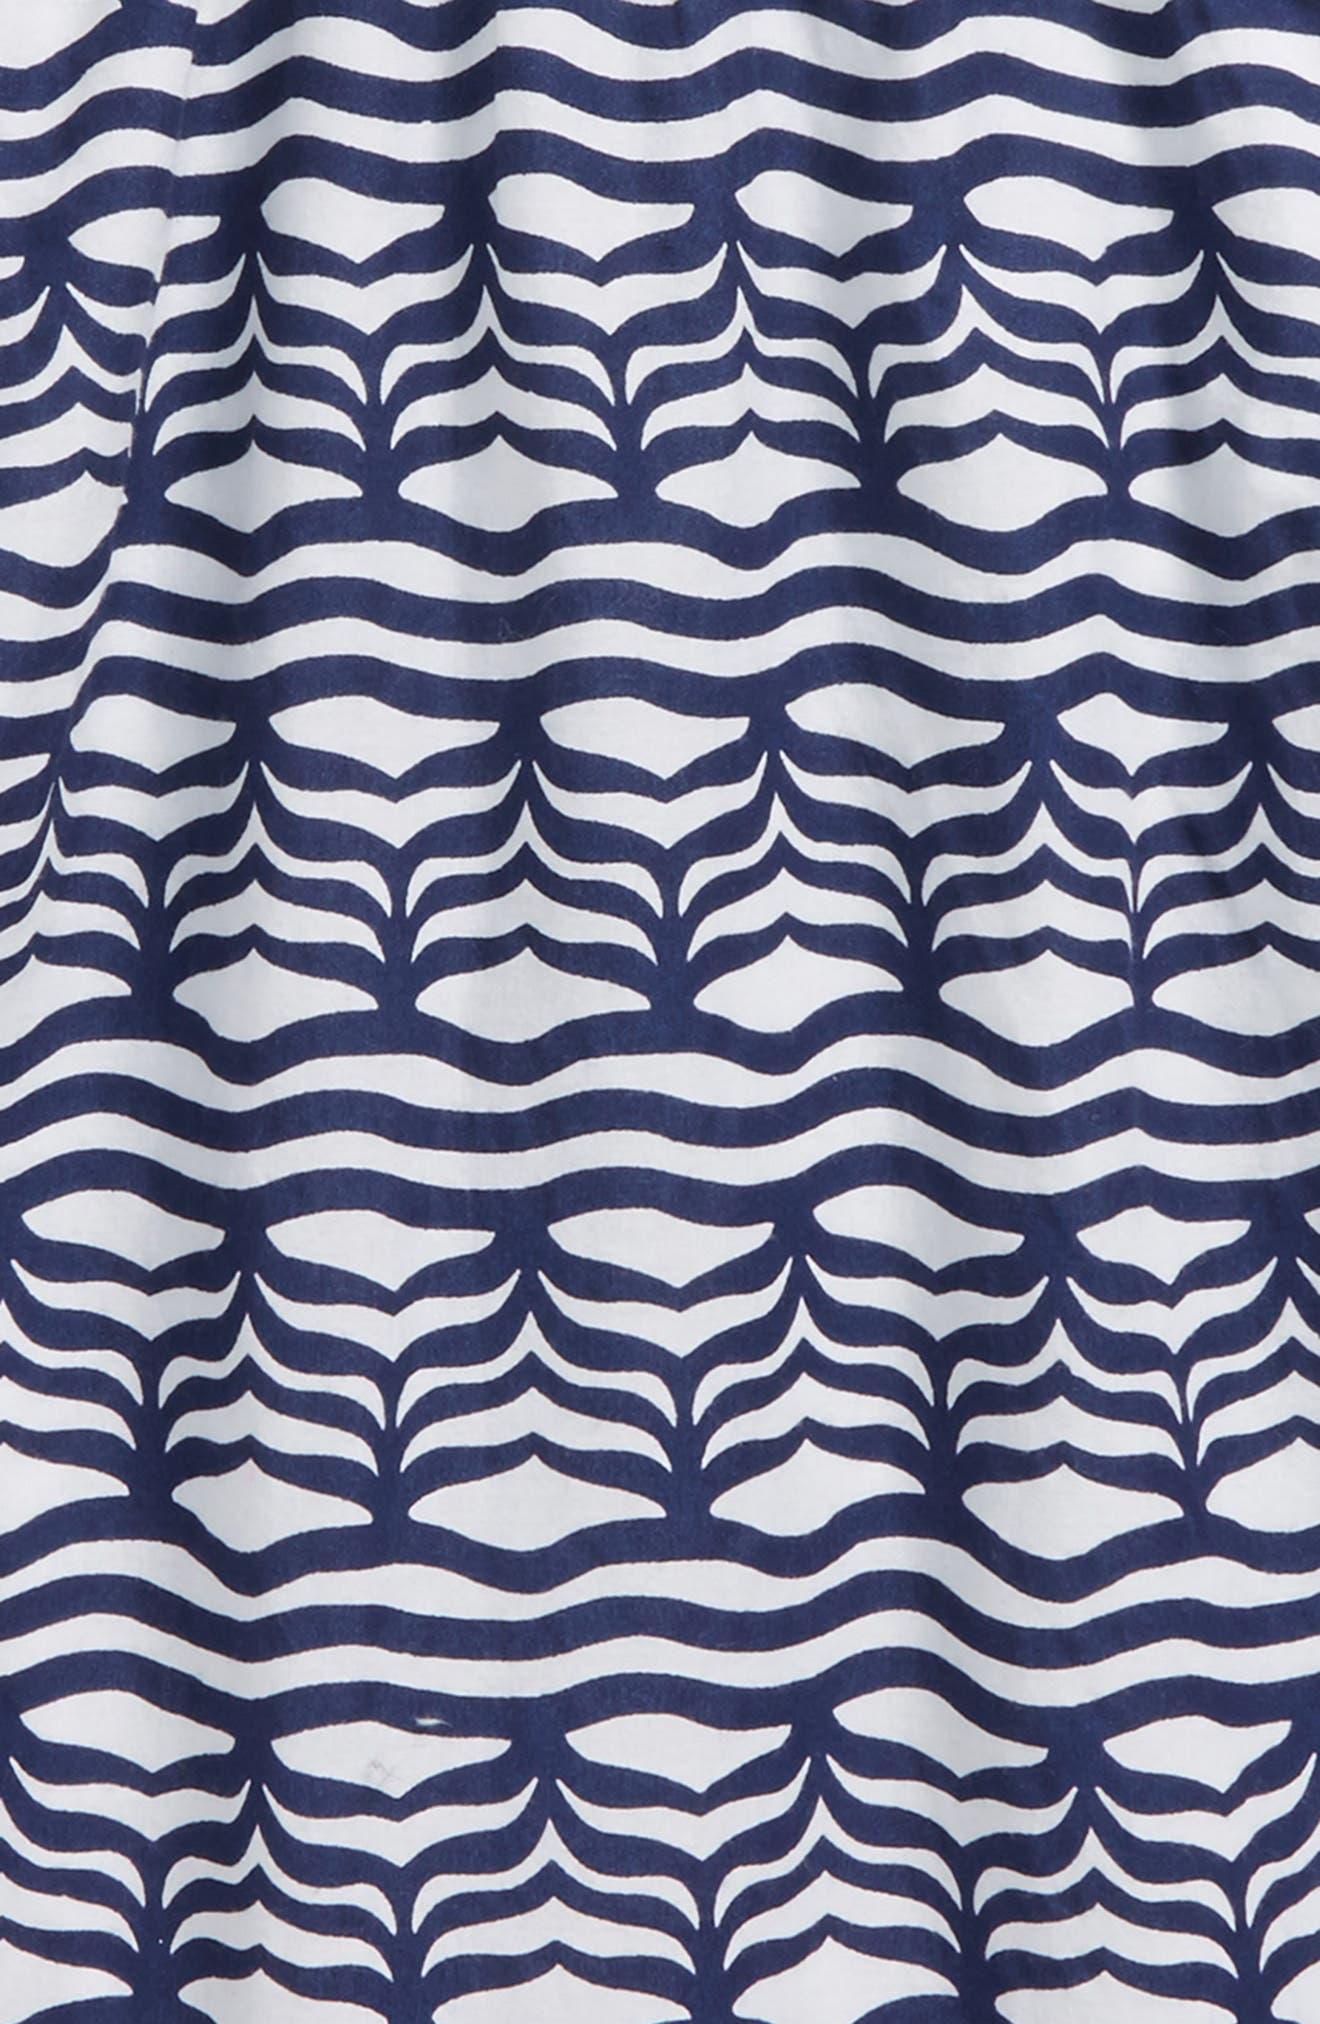 Whale Tail Wave Dress,                             Alternate thumbnail 3, color,                             400